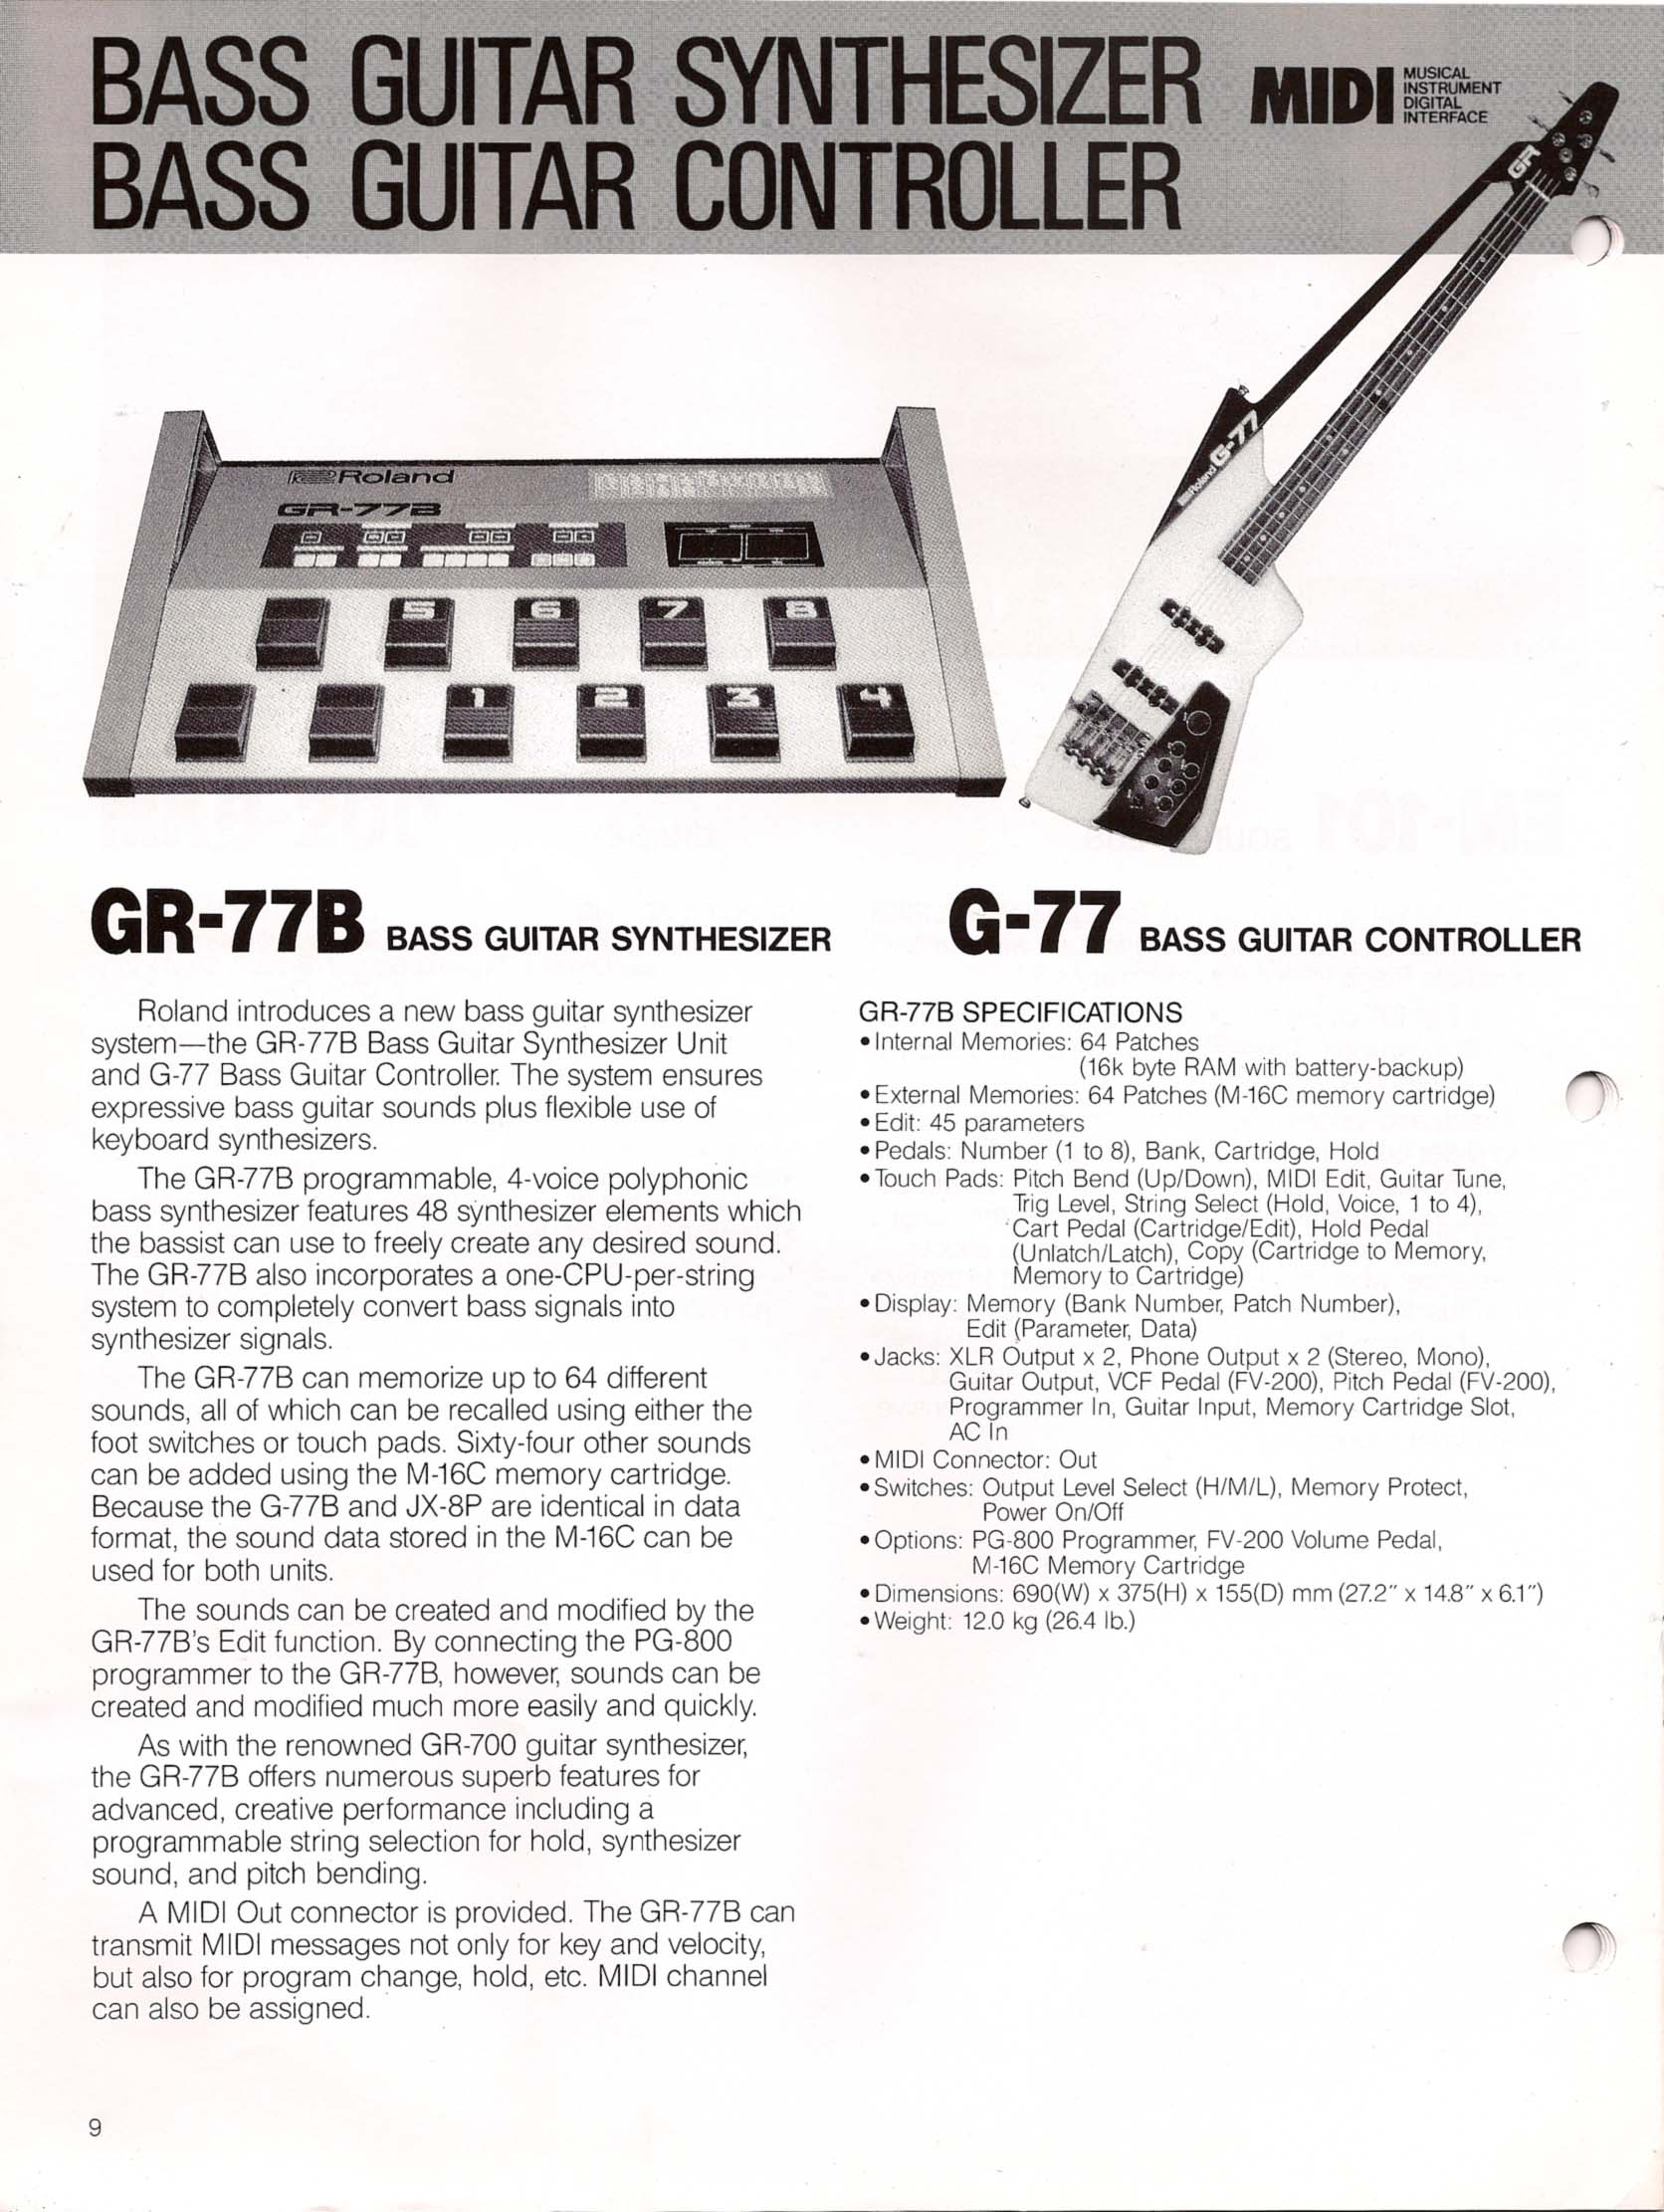 Summer Namm 1985 Equipment Spectacular Guitar Player Magazine Gibson Explorer Wiring Schematic Brochure